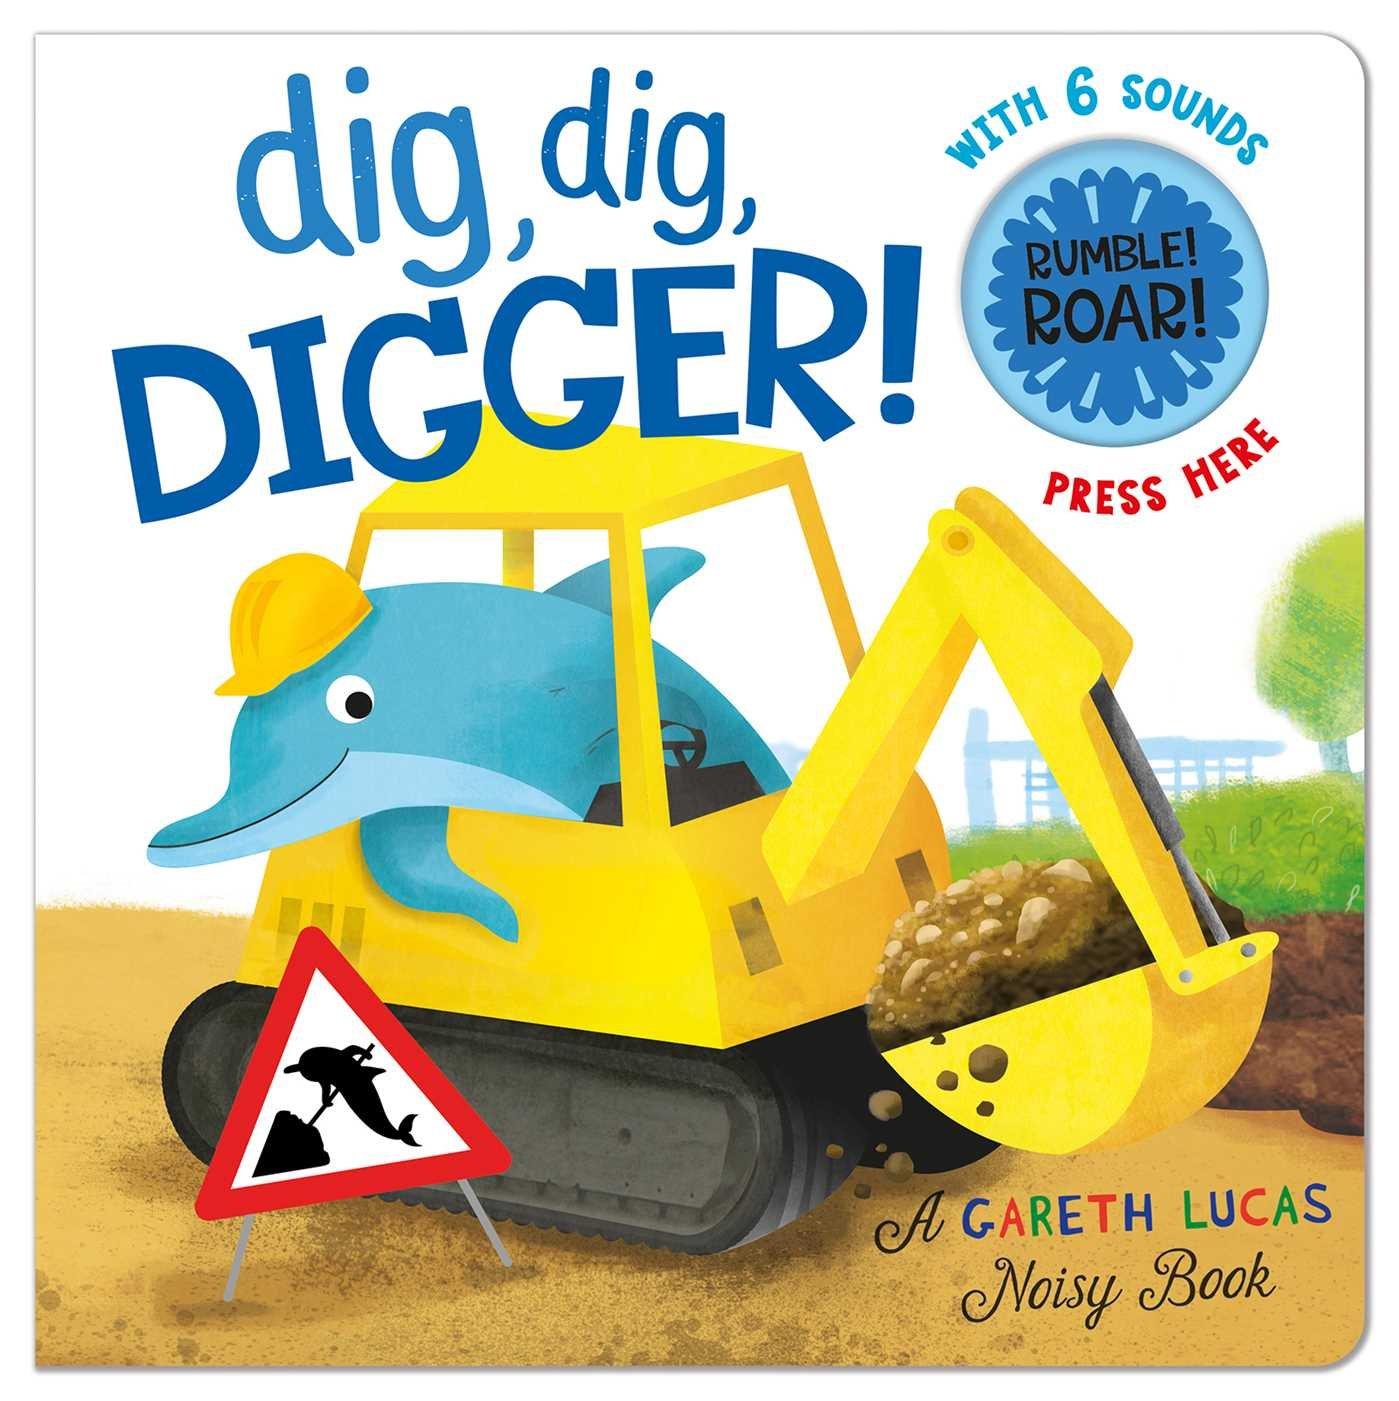 Dig Dig Digger Gareth Lucas Noisy Books  ebook by Gareth Lucas